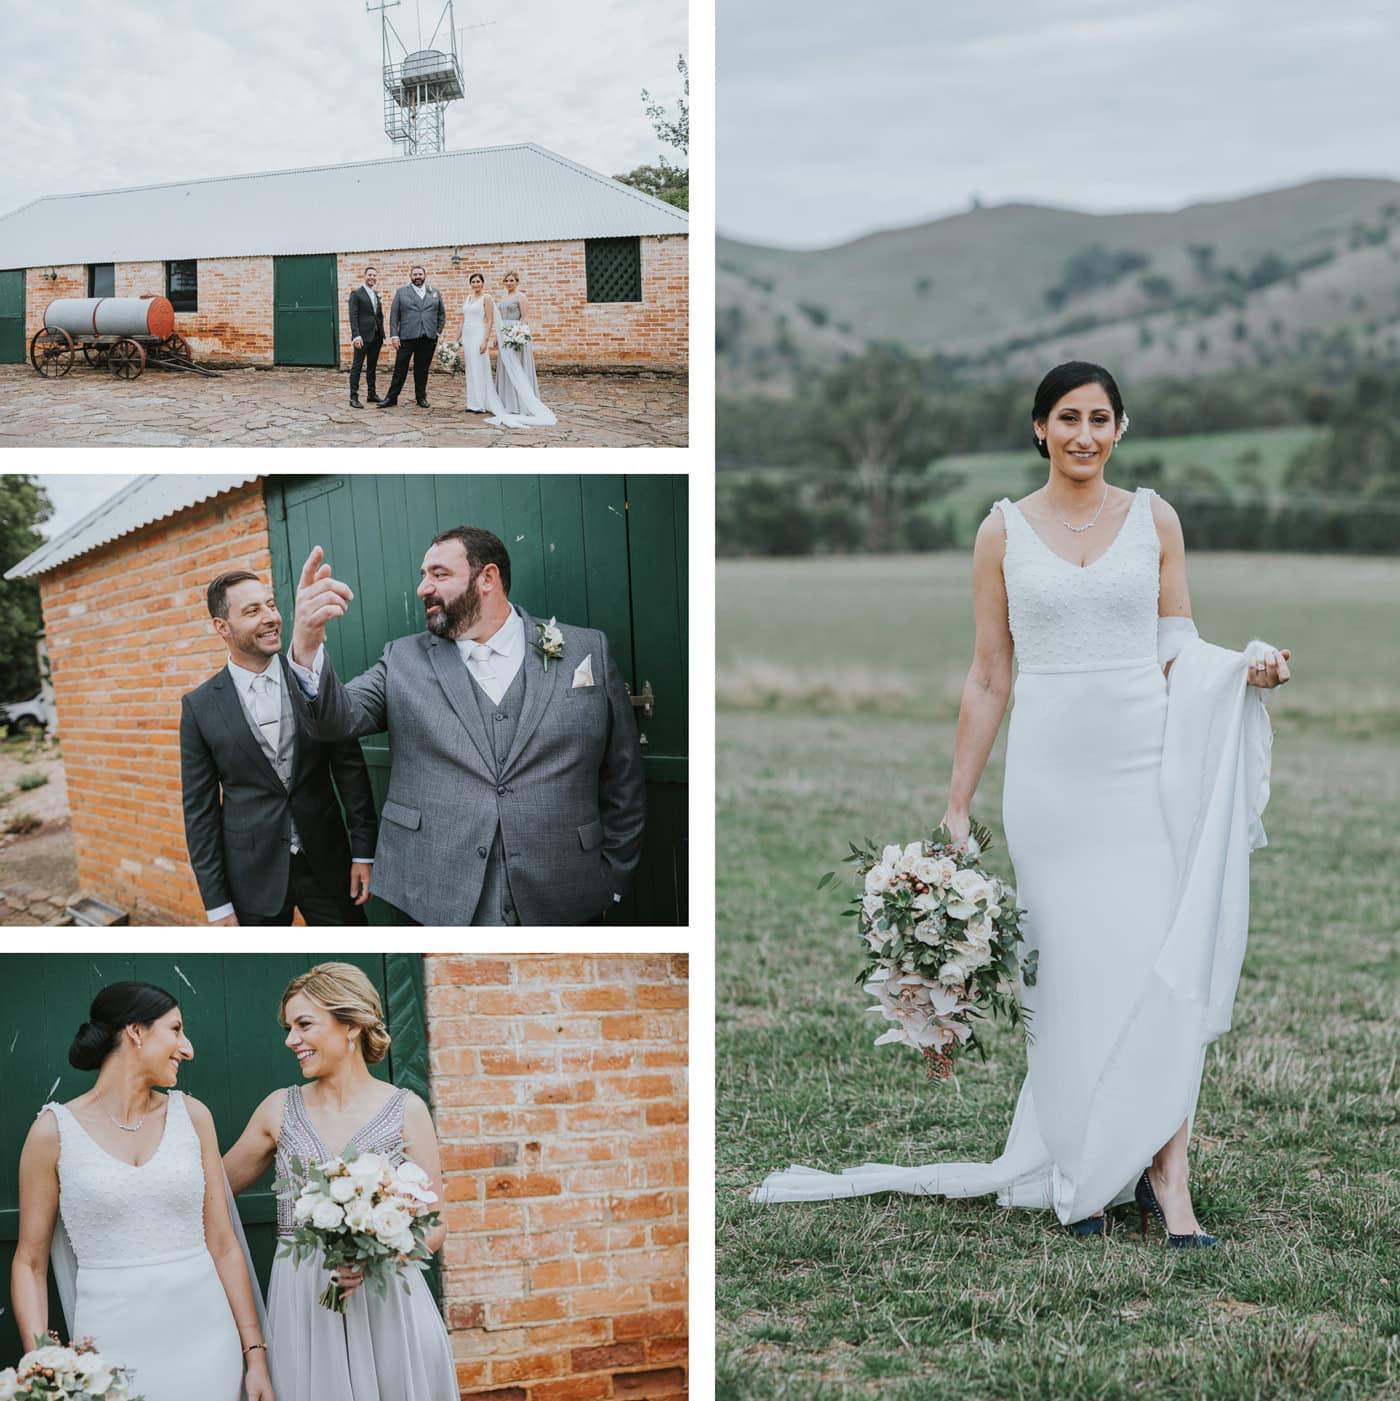 Best photography at Flowerdale Estate - Wedding photography by freshphotography